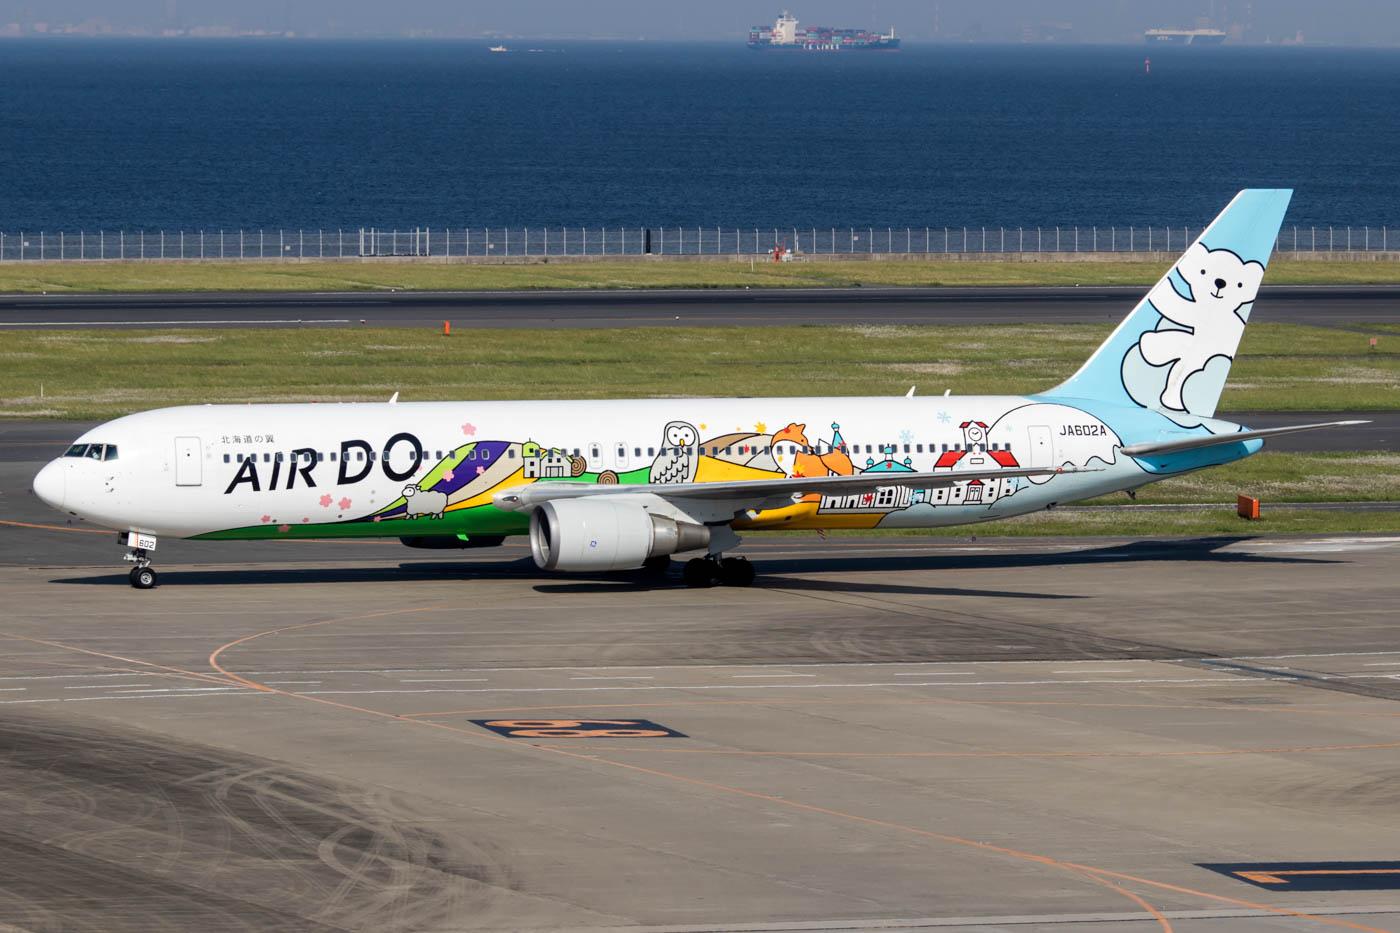 Bear Do Hokkaido Jet